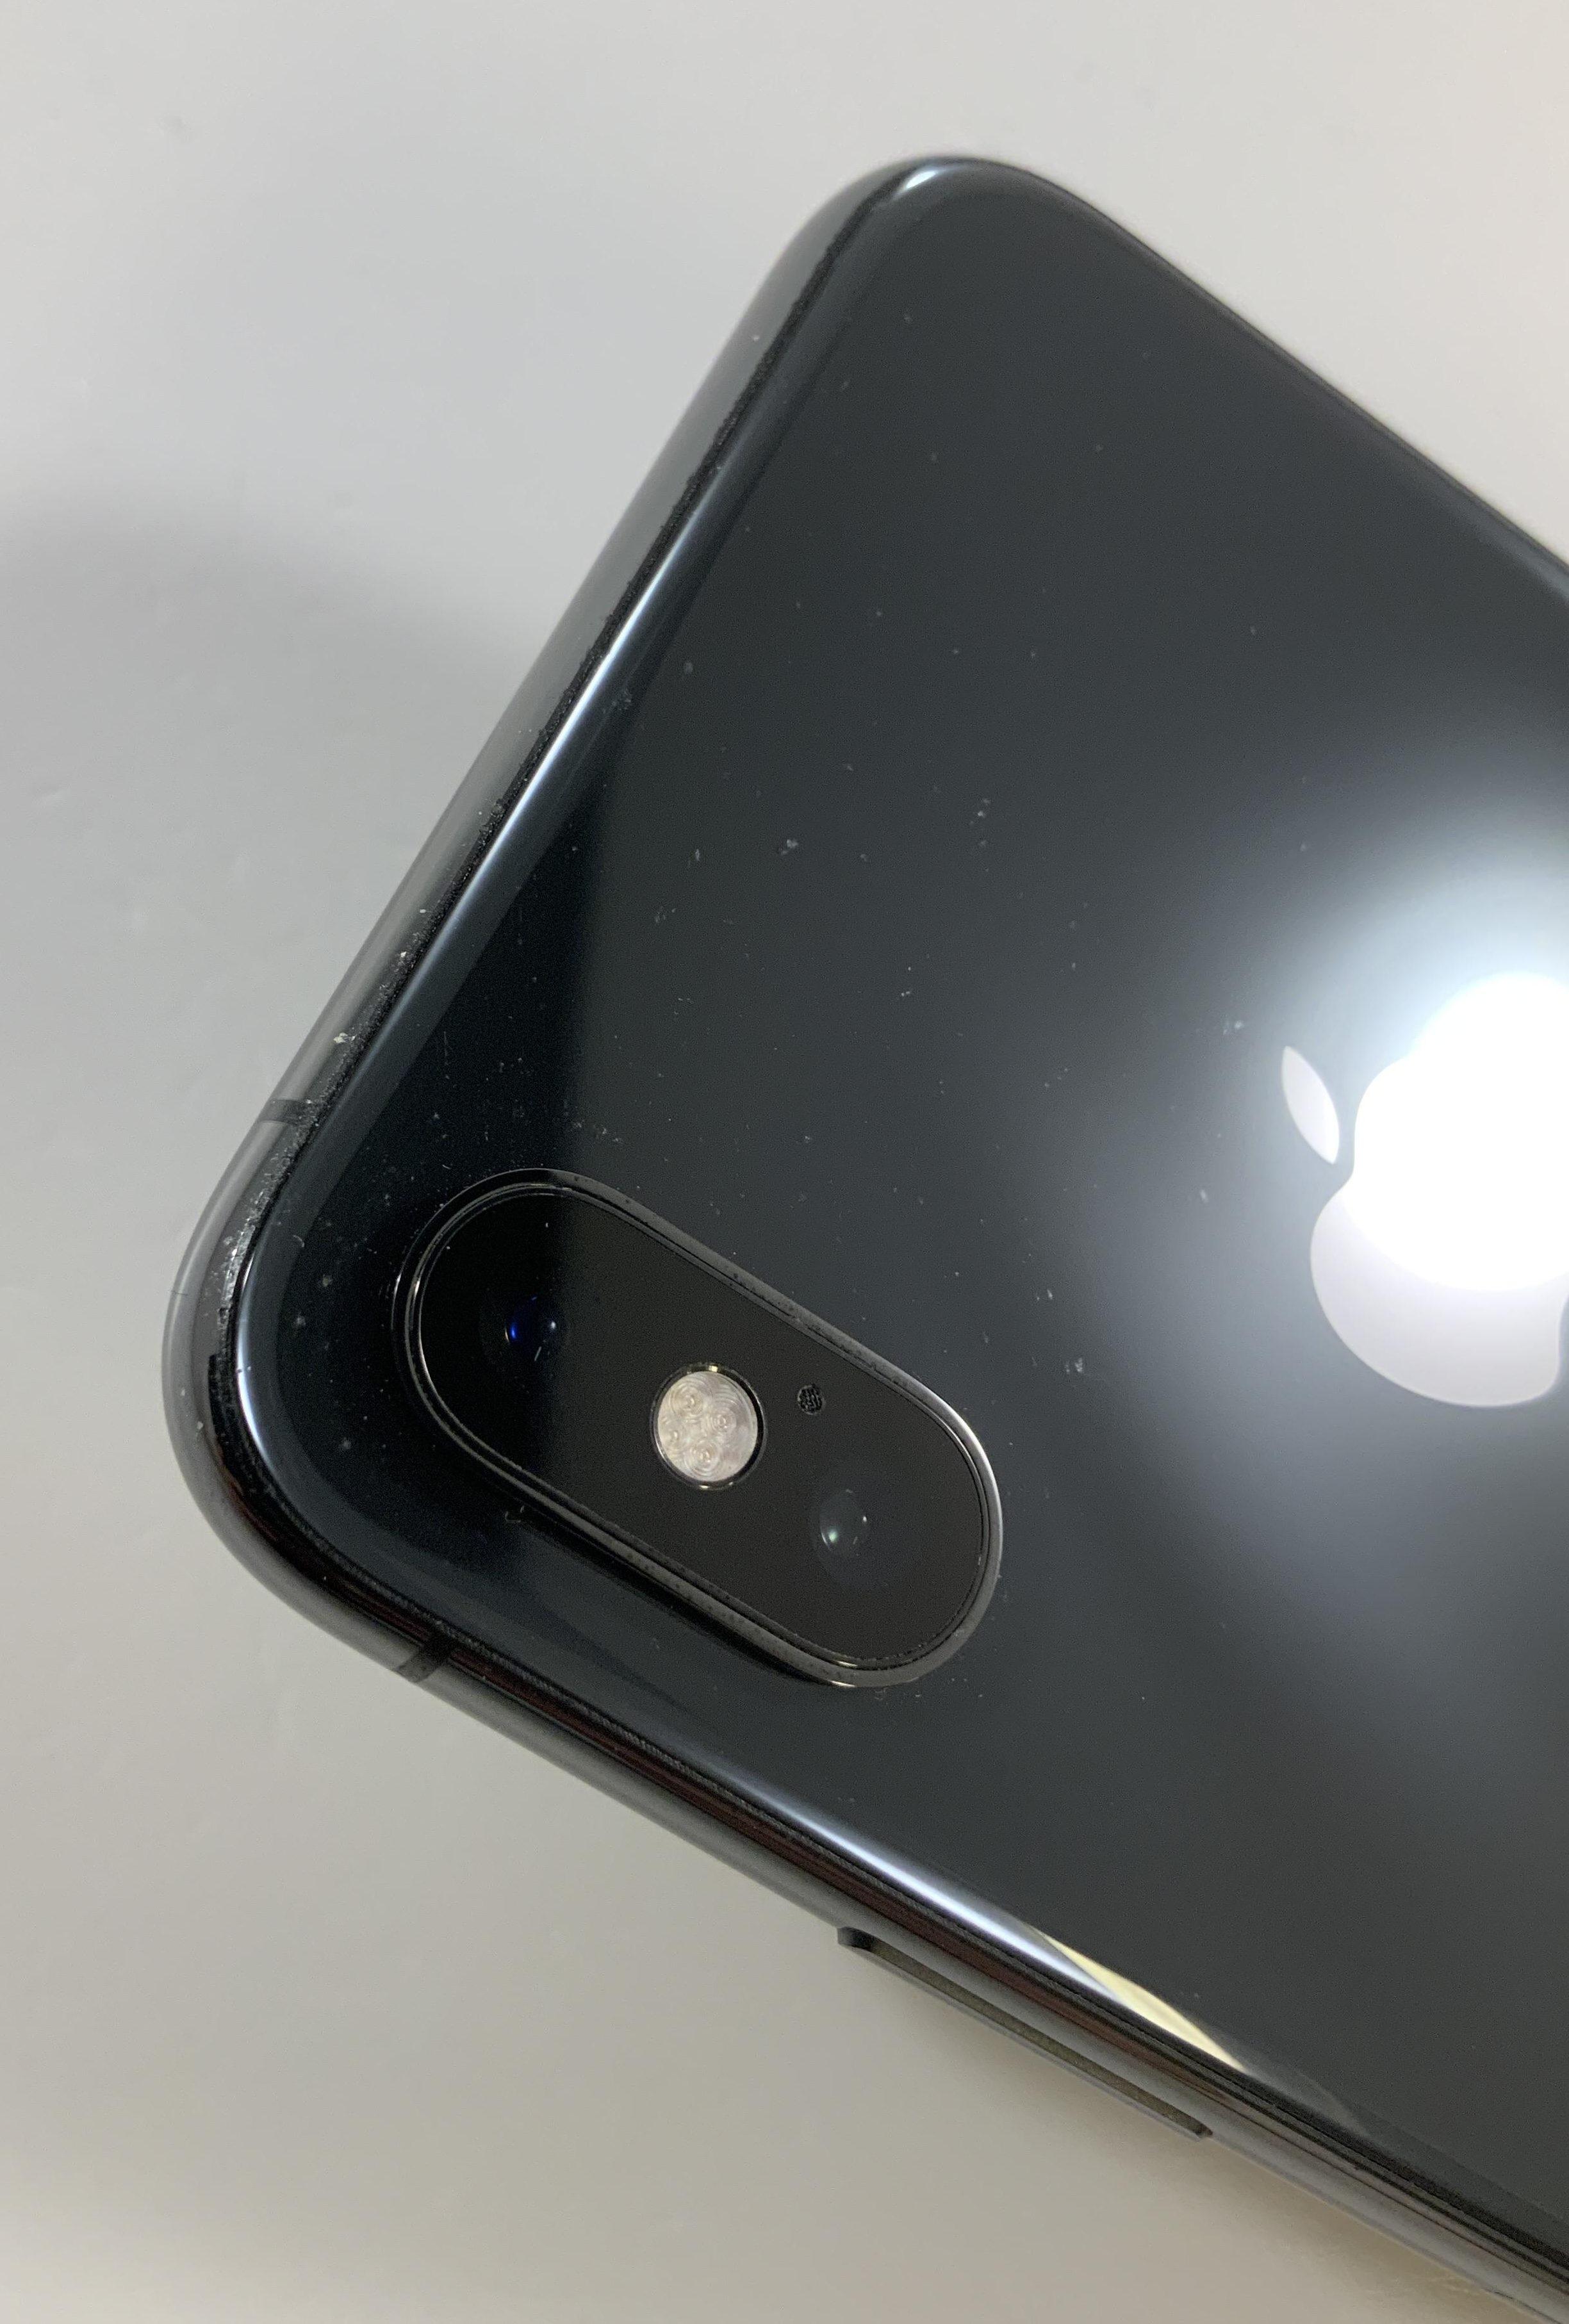 iPhone XS 64GB, 64GB, Space Gray, immagine 5